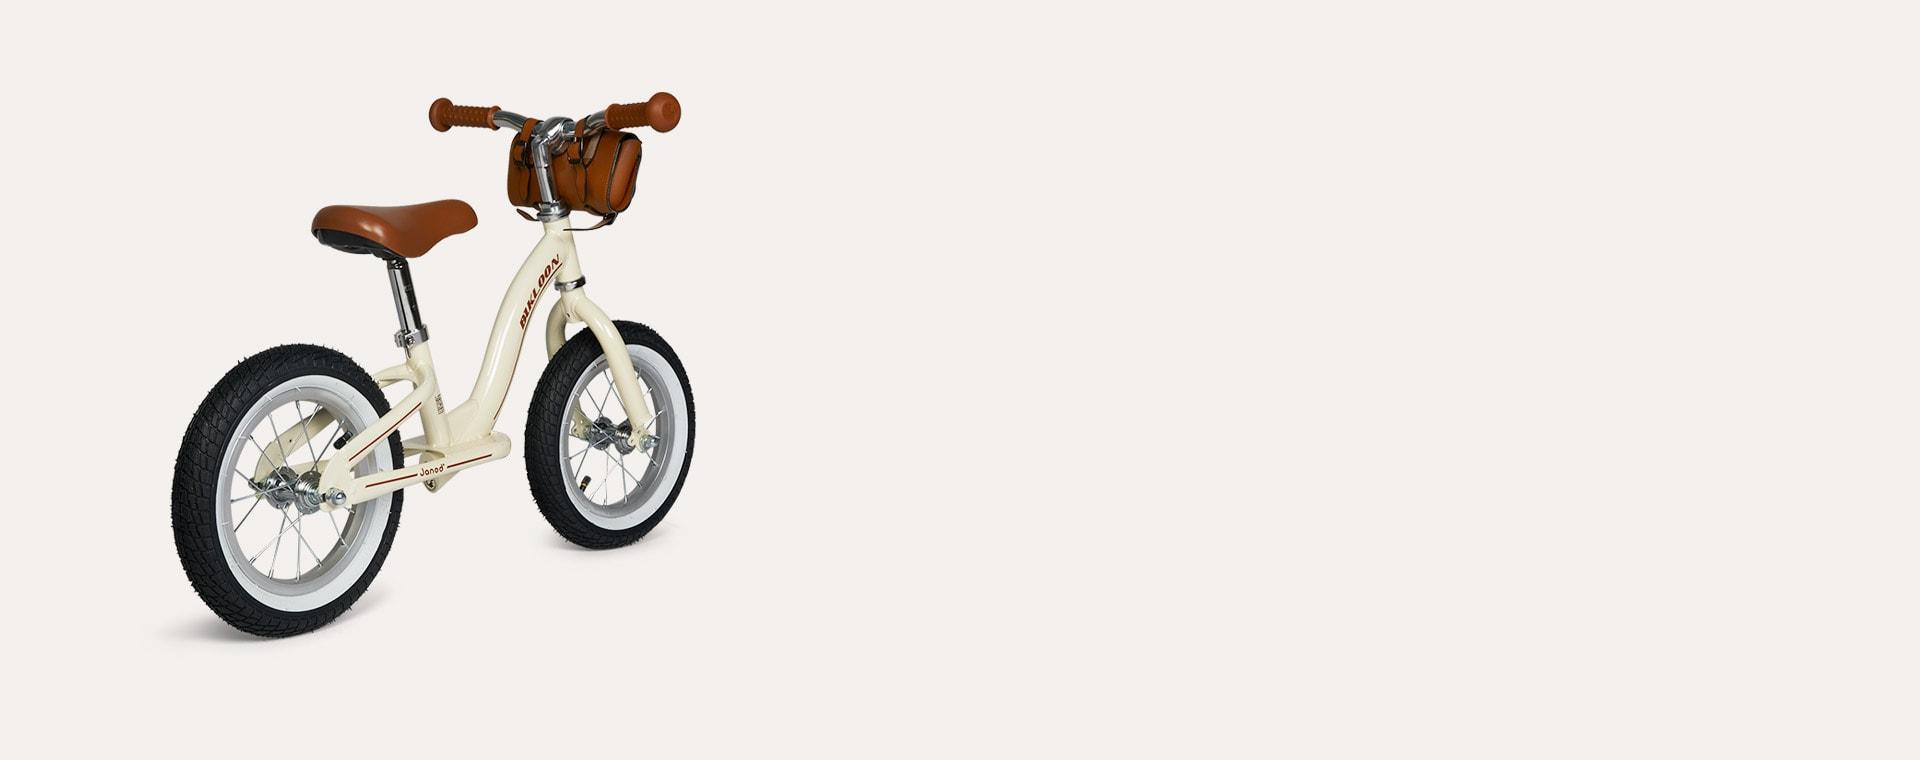 Neutral Janod Vintage Metal Bikloon Balance Bike